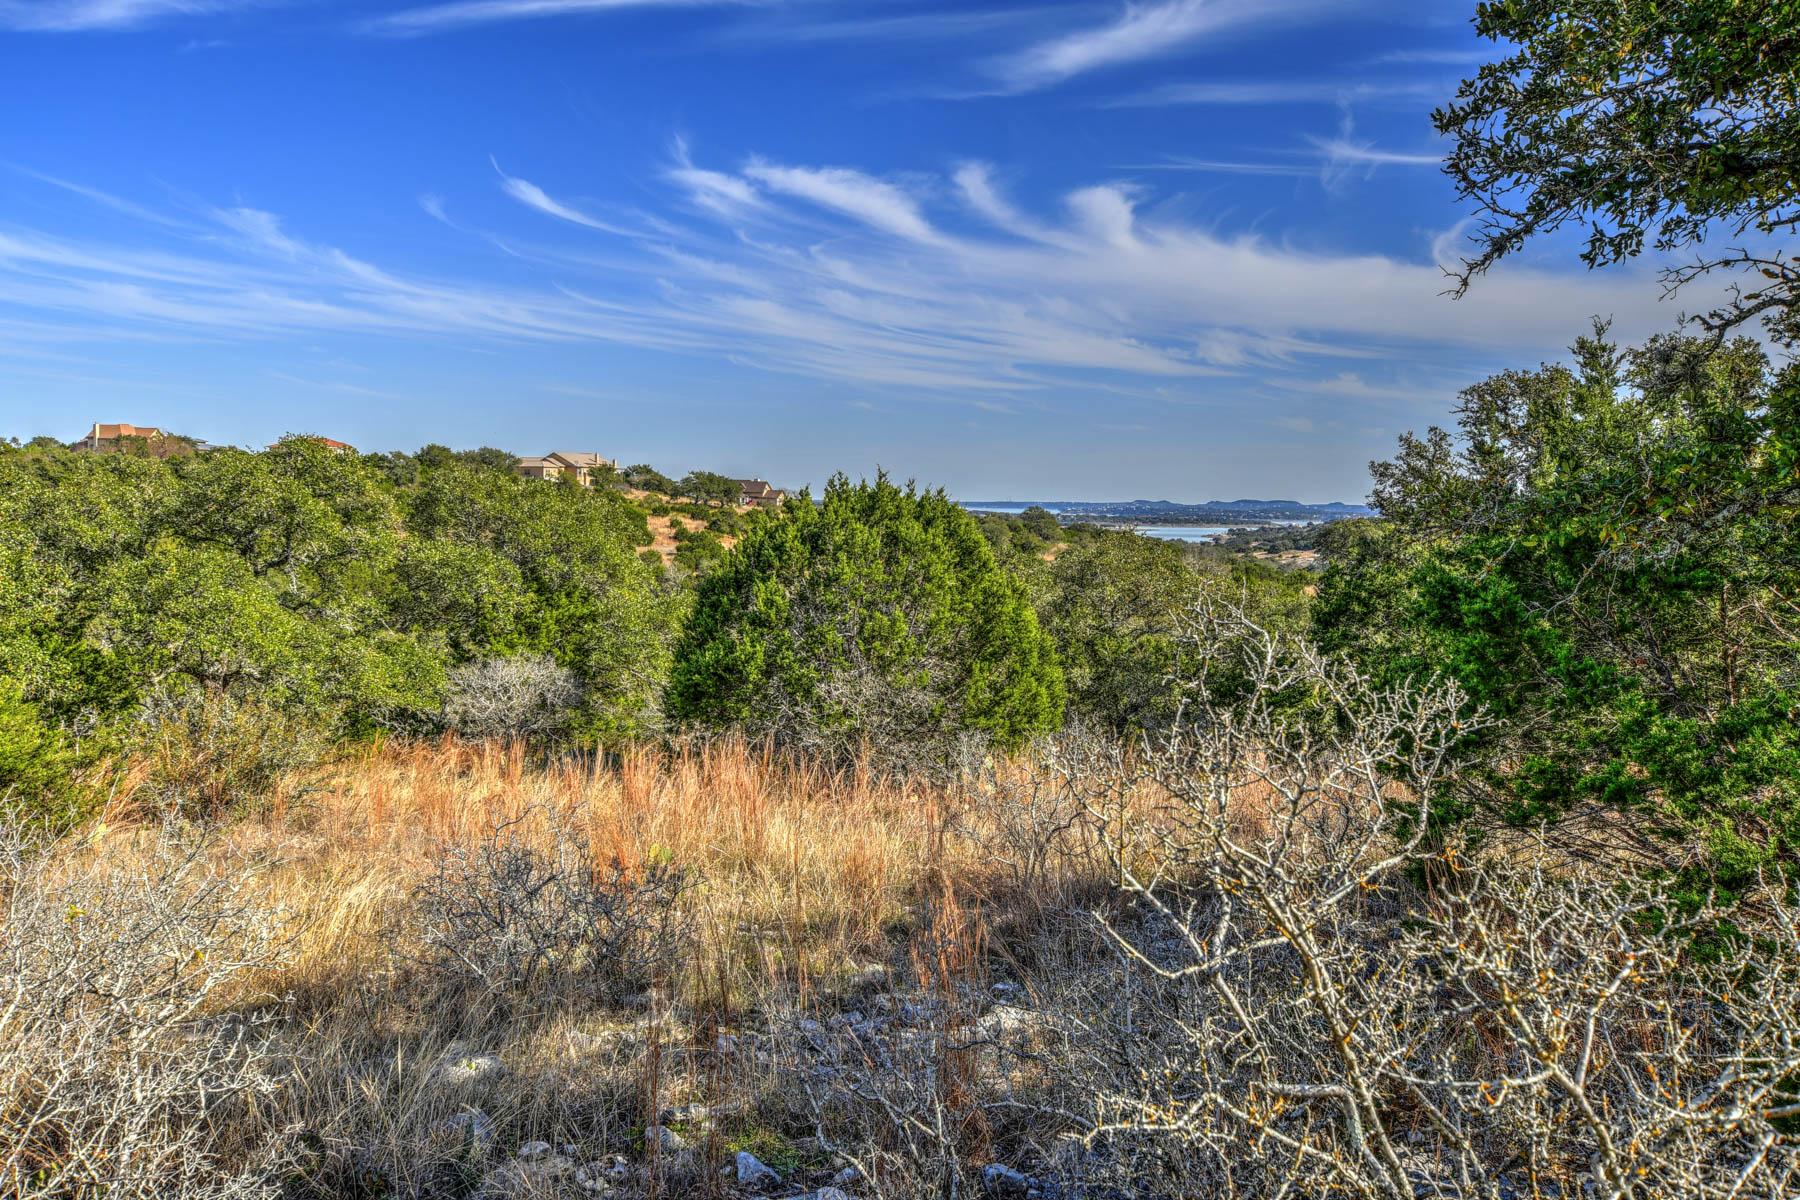 Additional photo for property listing at 334/346 Blackbird Drive, Spring Branch, TX 78070 334/346 Blackbird Drive Spring Branch, Texas 78070 Estados Unidos